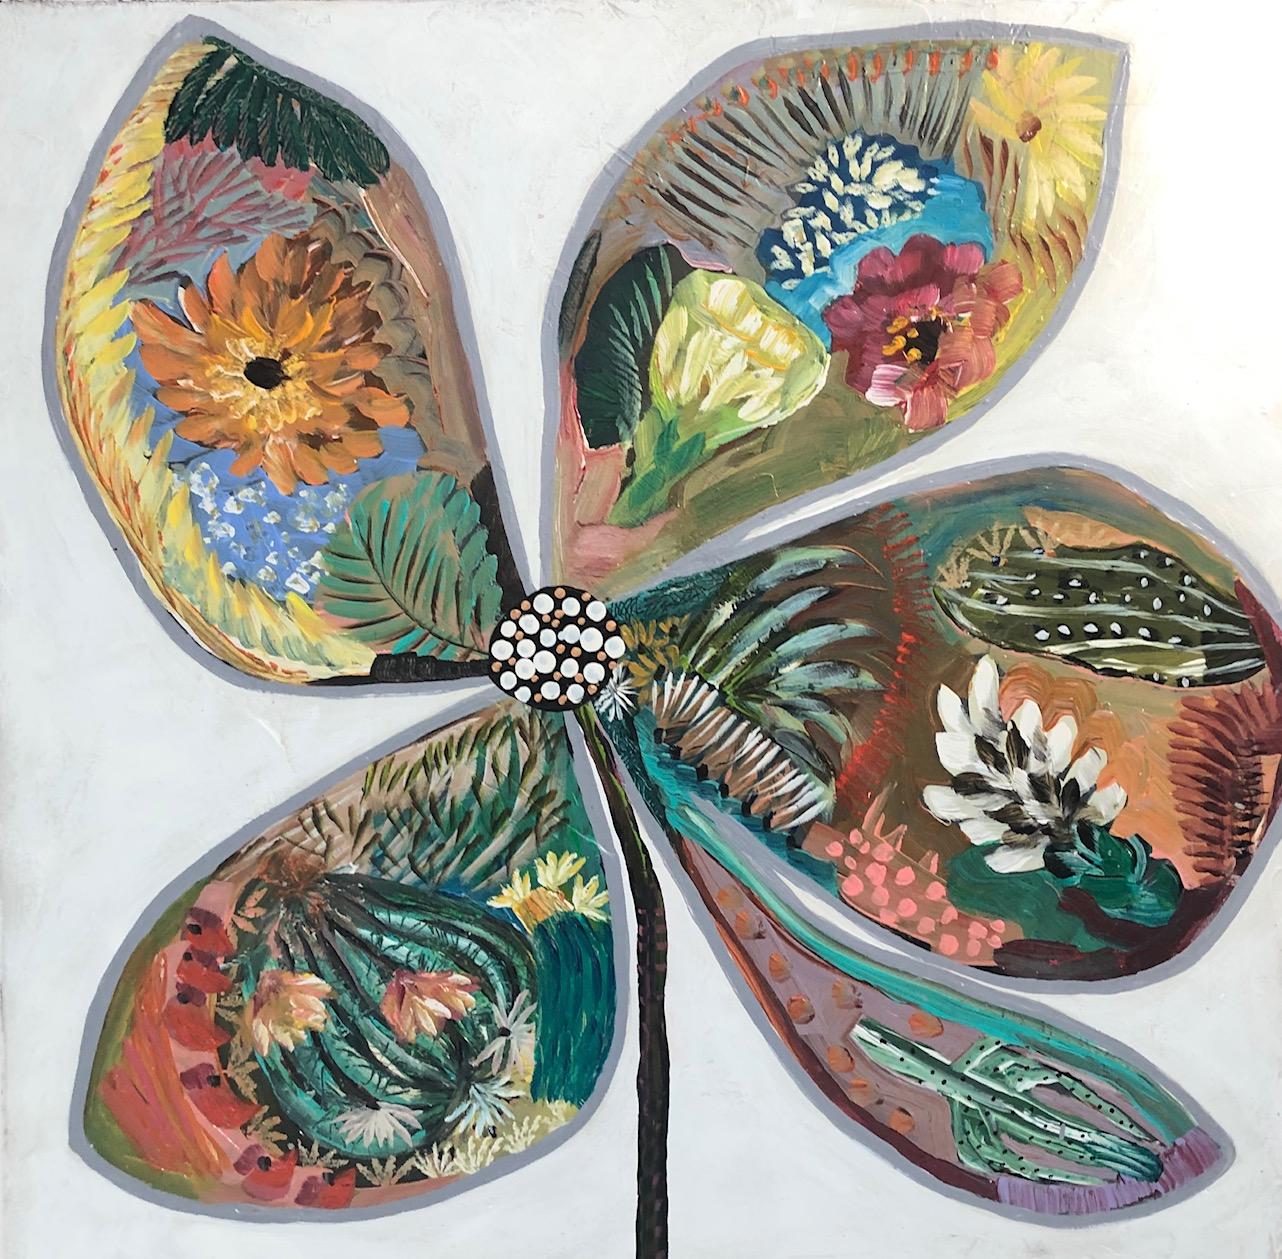 SVB19-WHITE FLOWERS 3 by Sarah Van Beckum   ArtworkNetwork.com